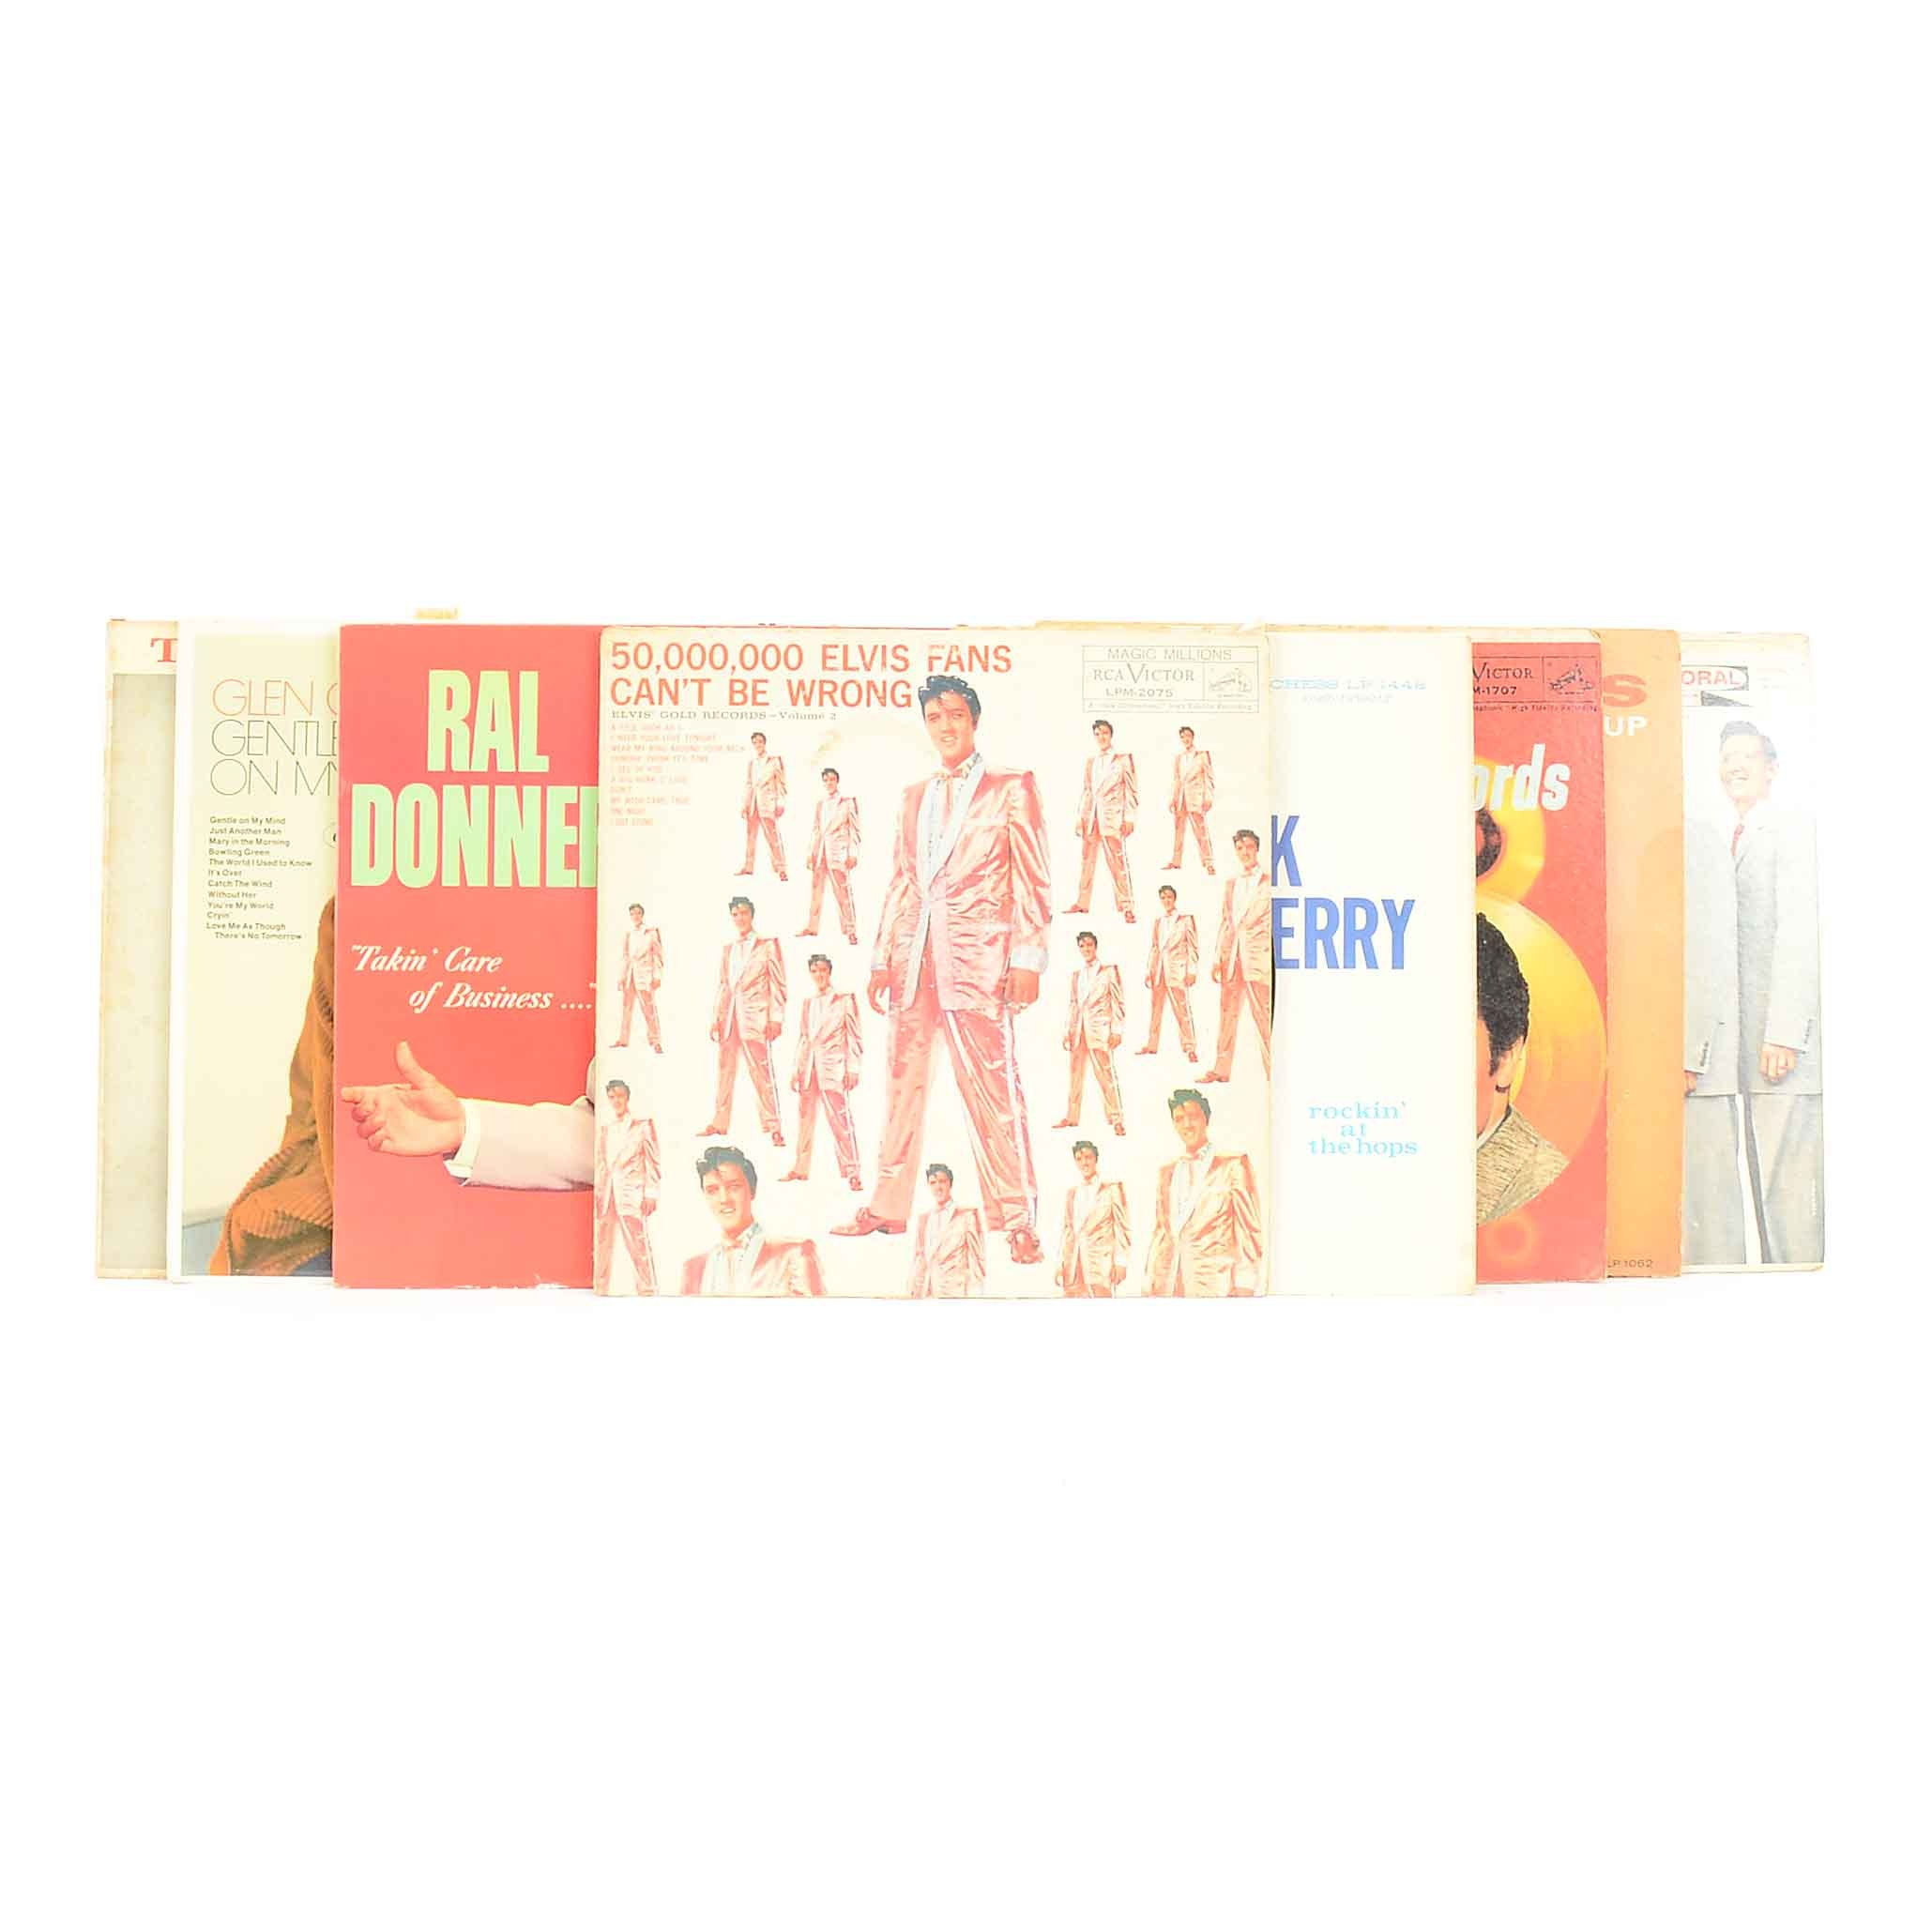 Eight 33 RPM LP Vinyl Records of Elvis and Contemporaries